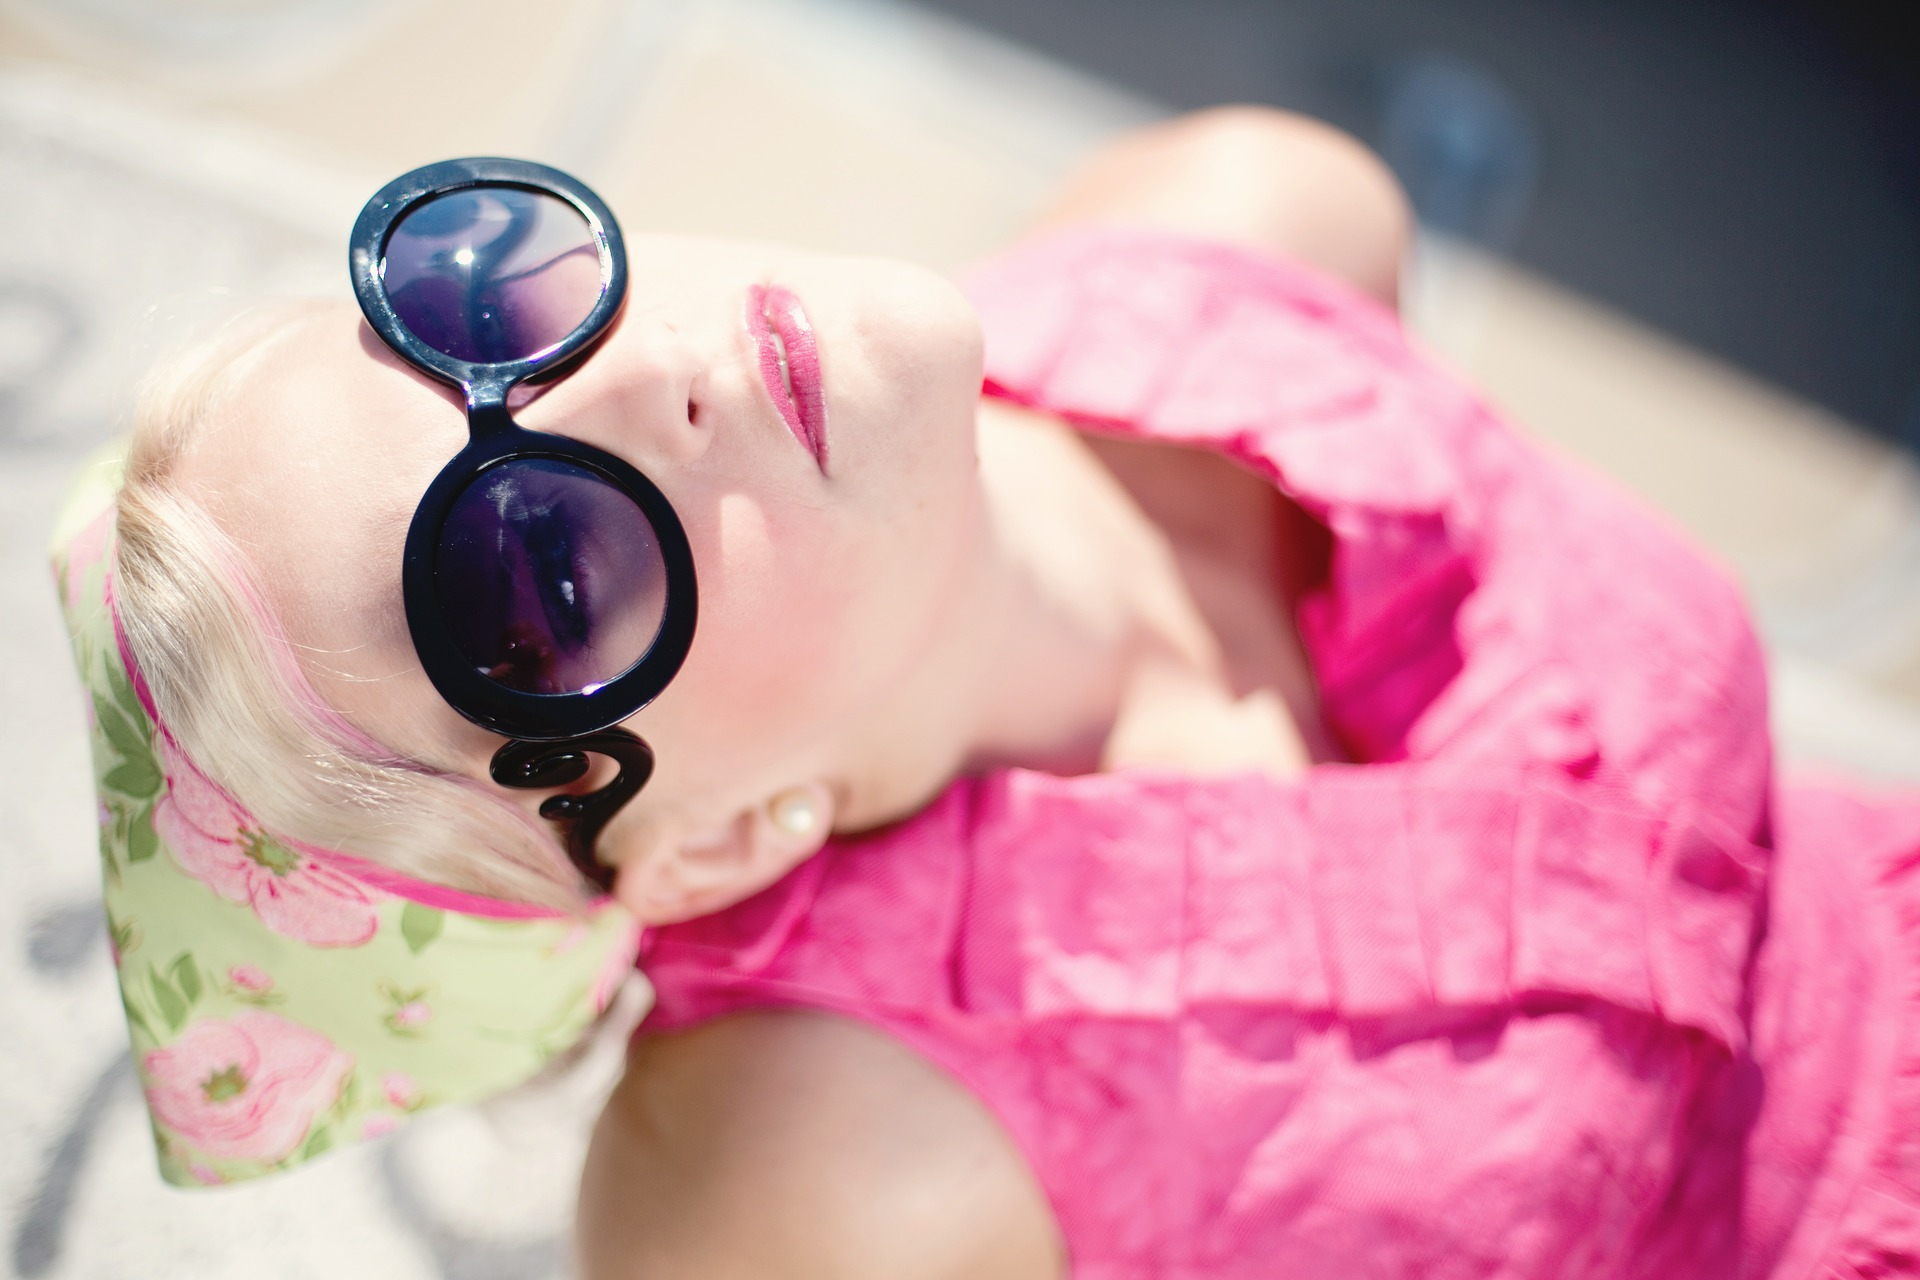 Blond woman wearing dark sunglasses and pink shirt